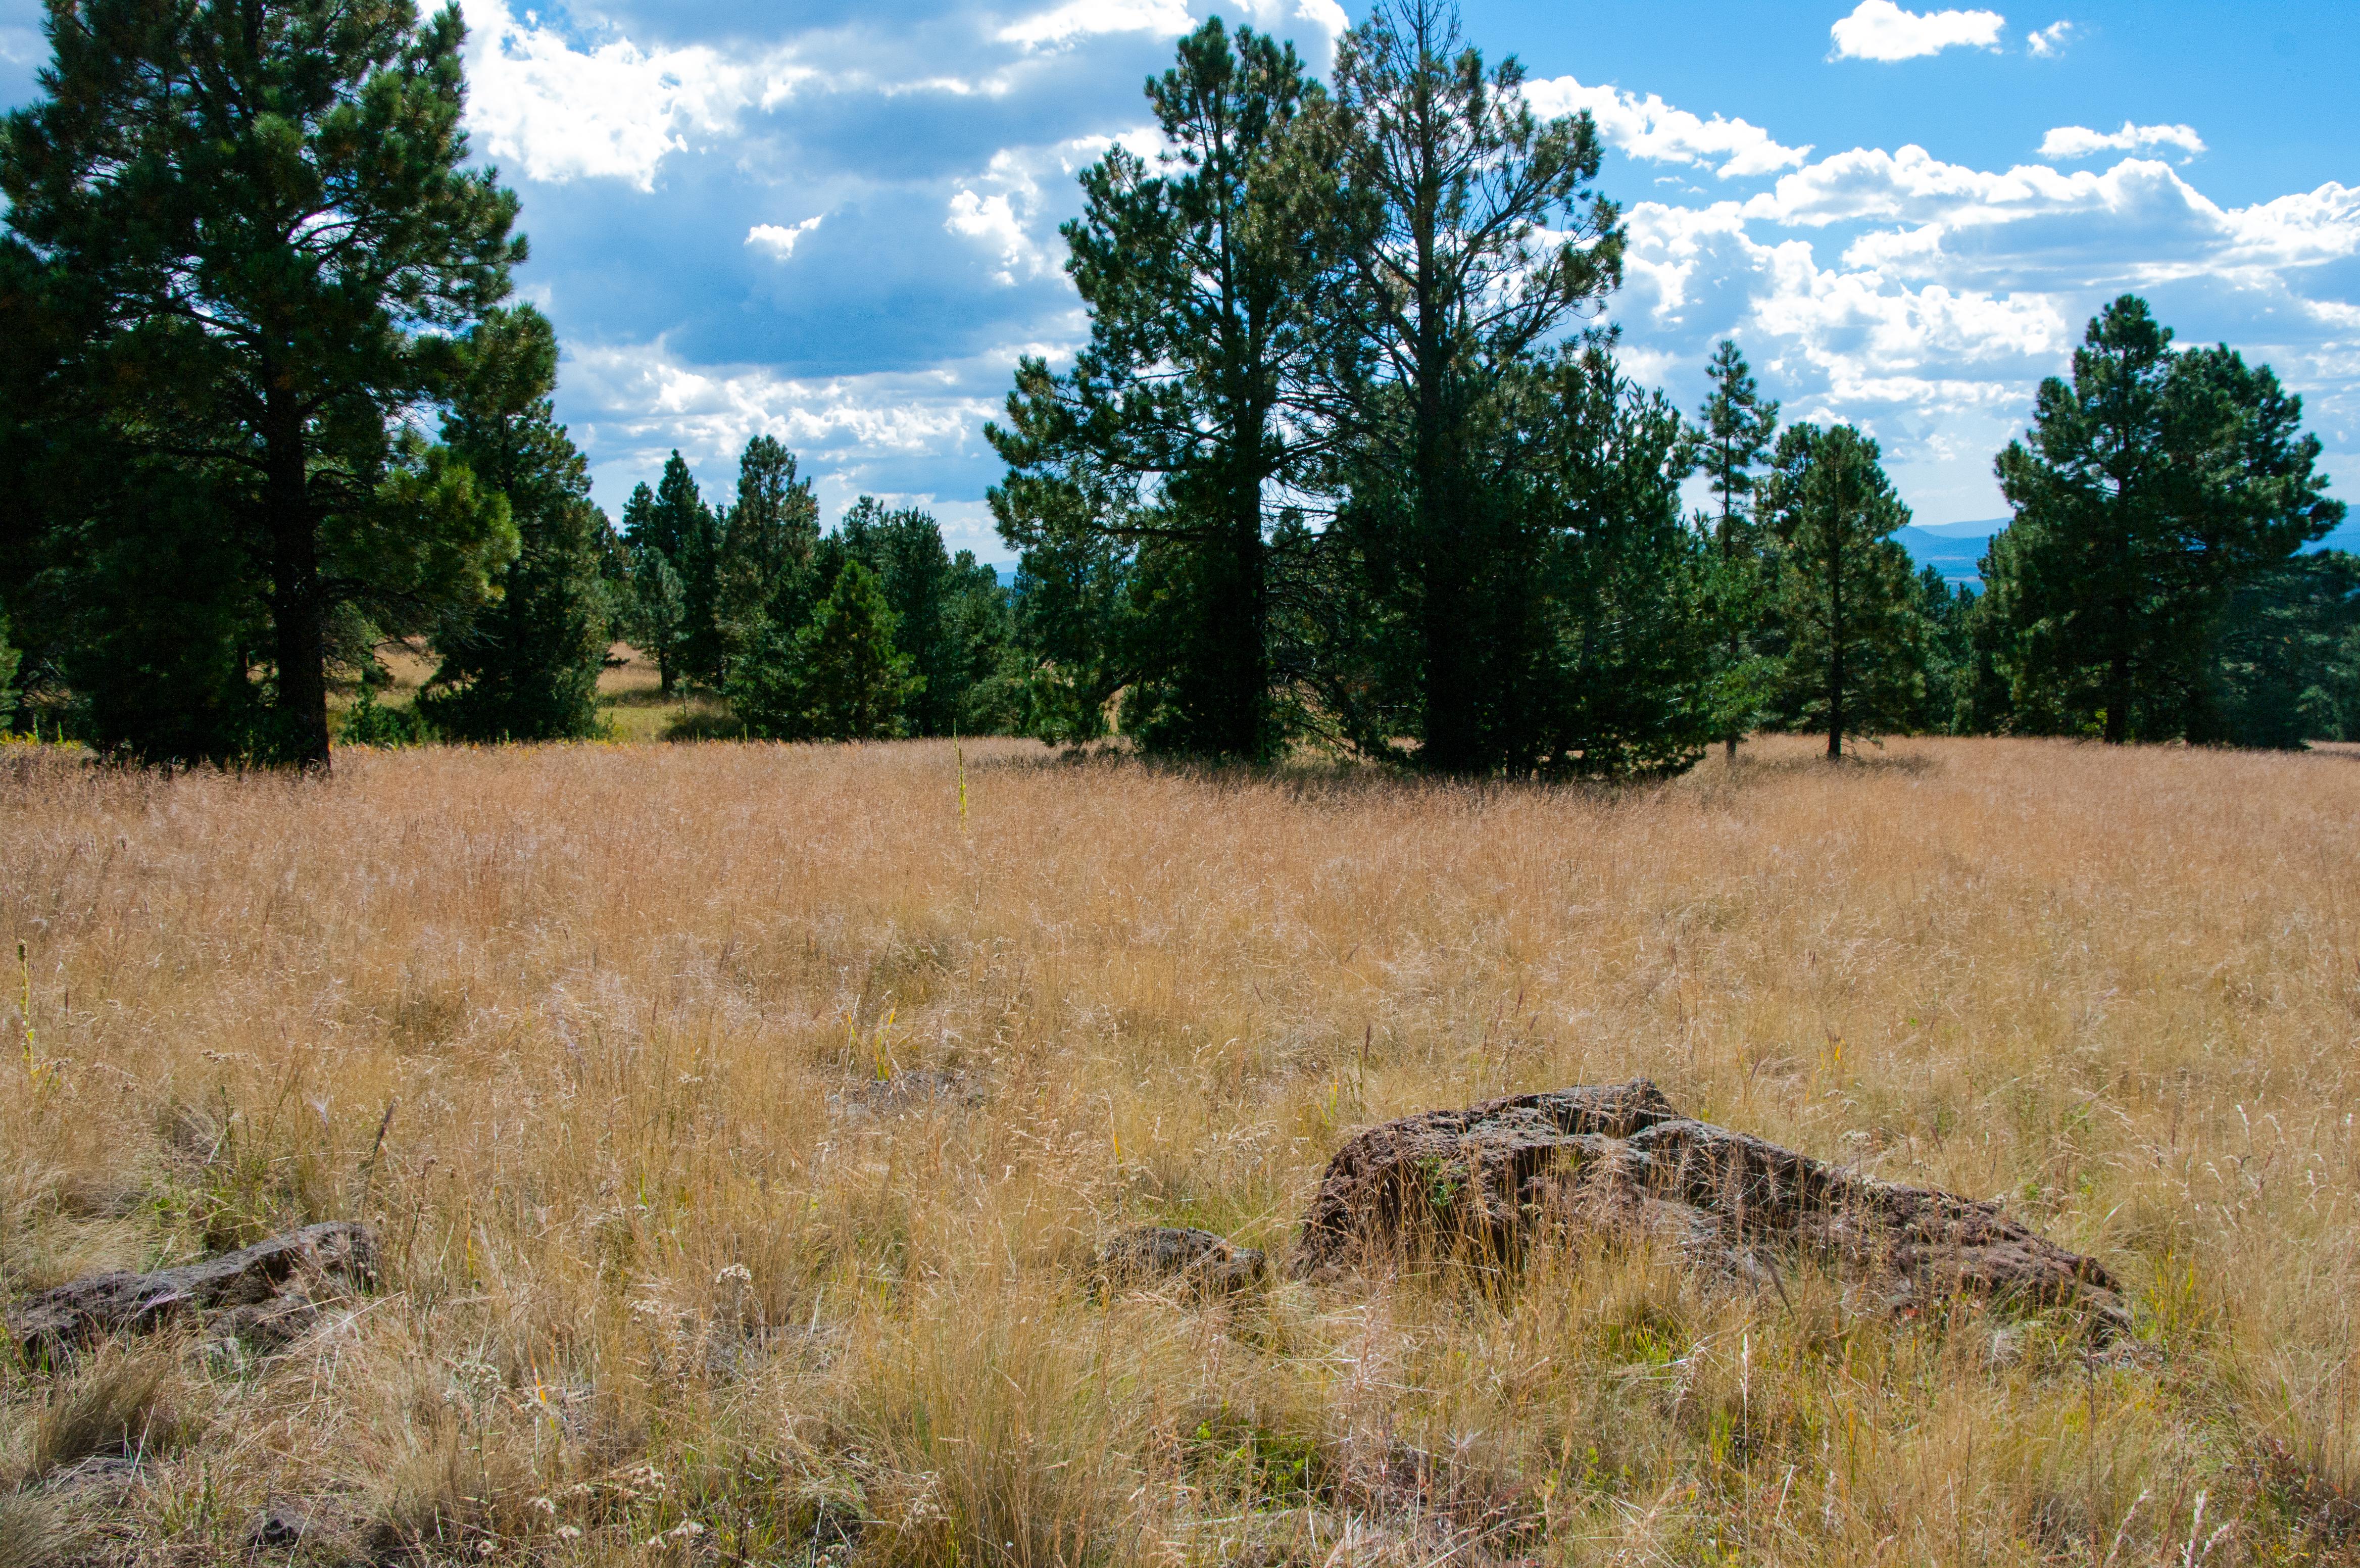 Aspen loop / arizona trail photo